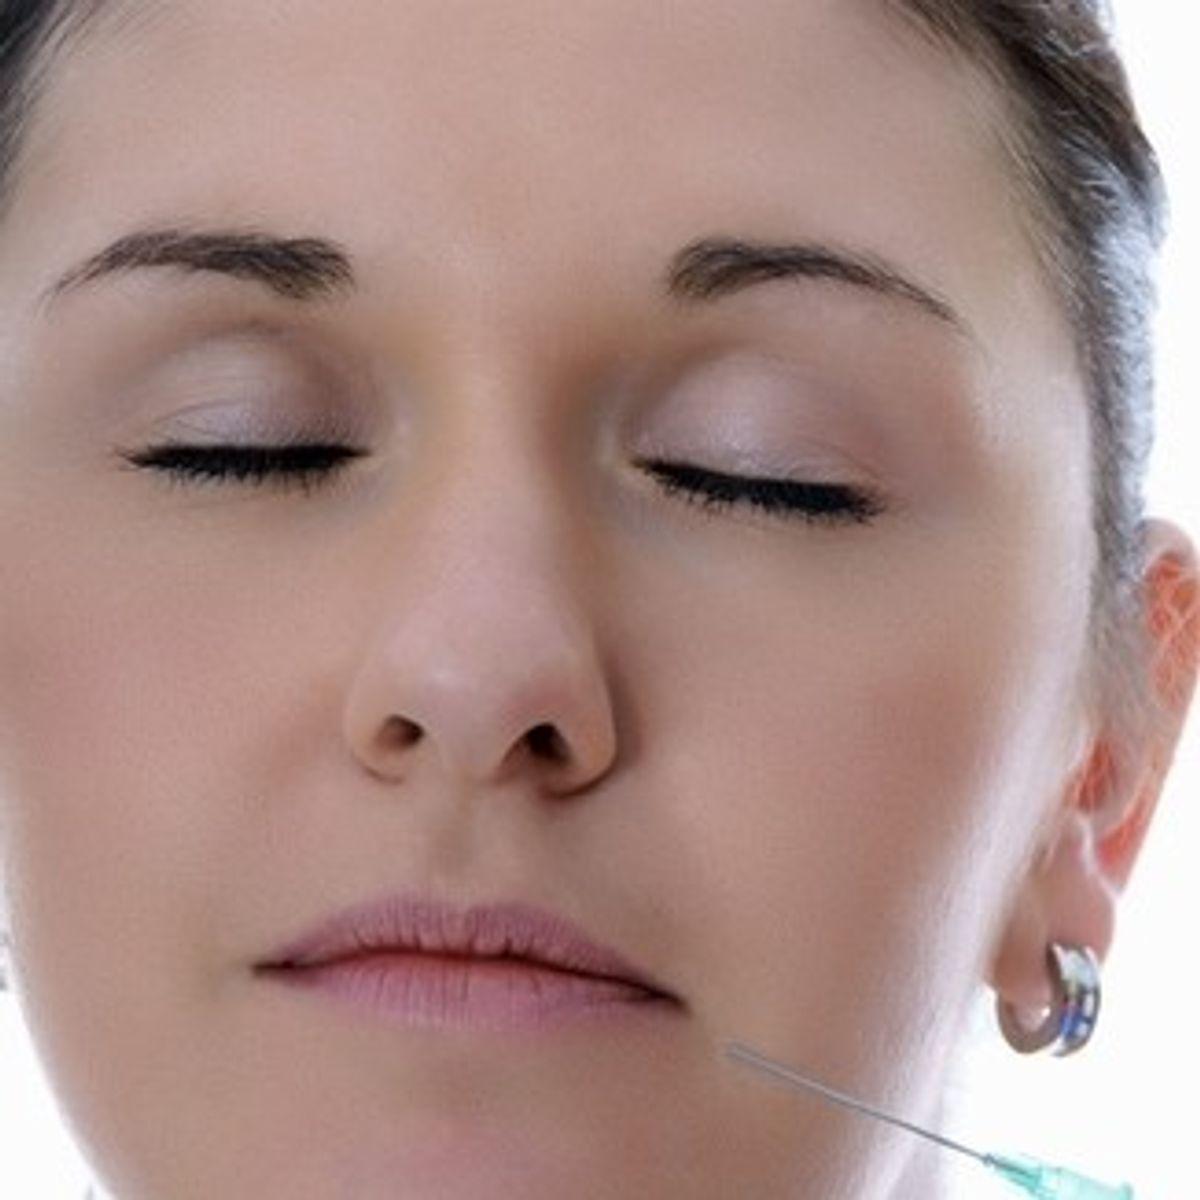 Botox injection   (<a href='http://www.shutterstock.com/gallery-660187p1.html'>PhotographyByMK</a> via <a href='http://www.shutterstock.com/'>Shutterstock</a>)